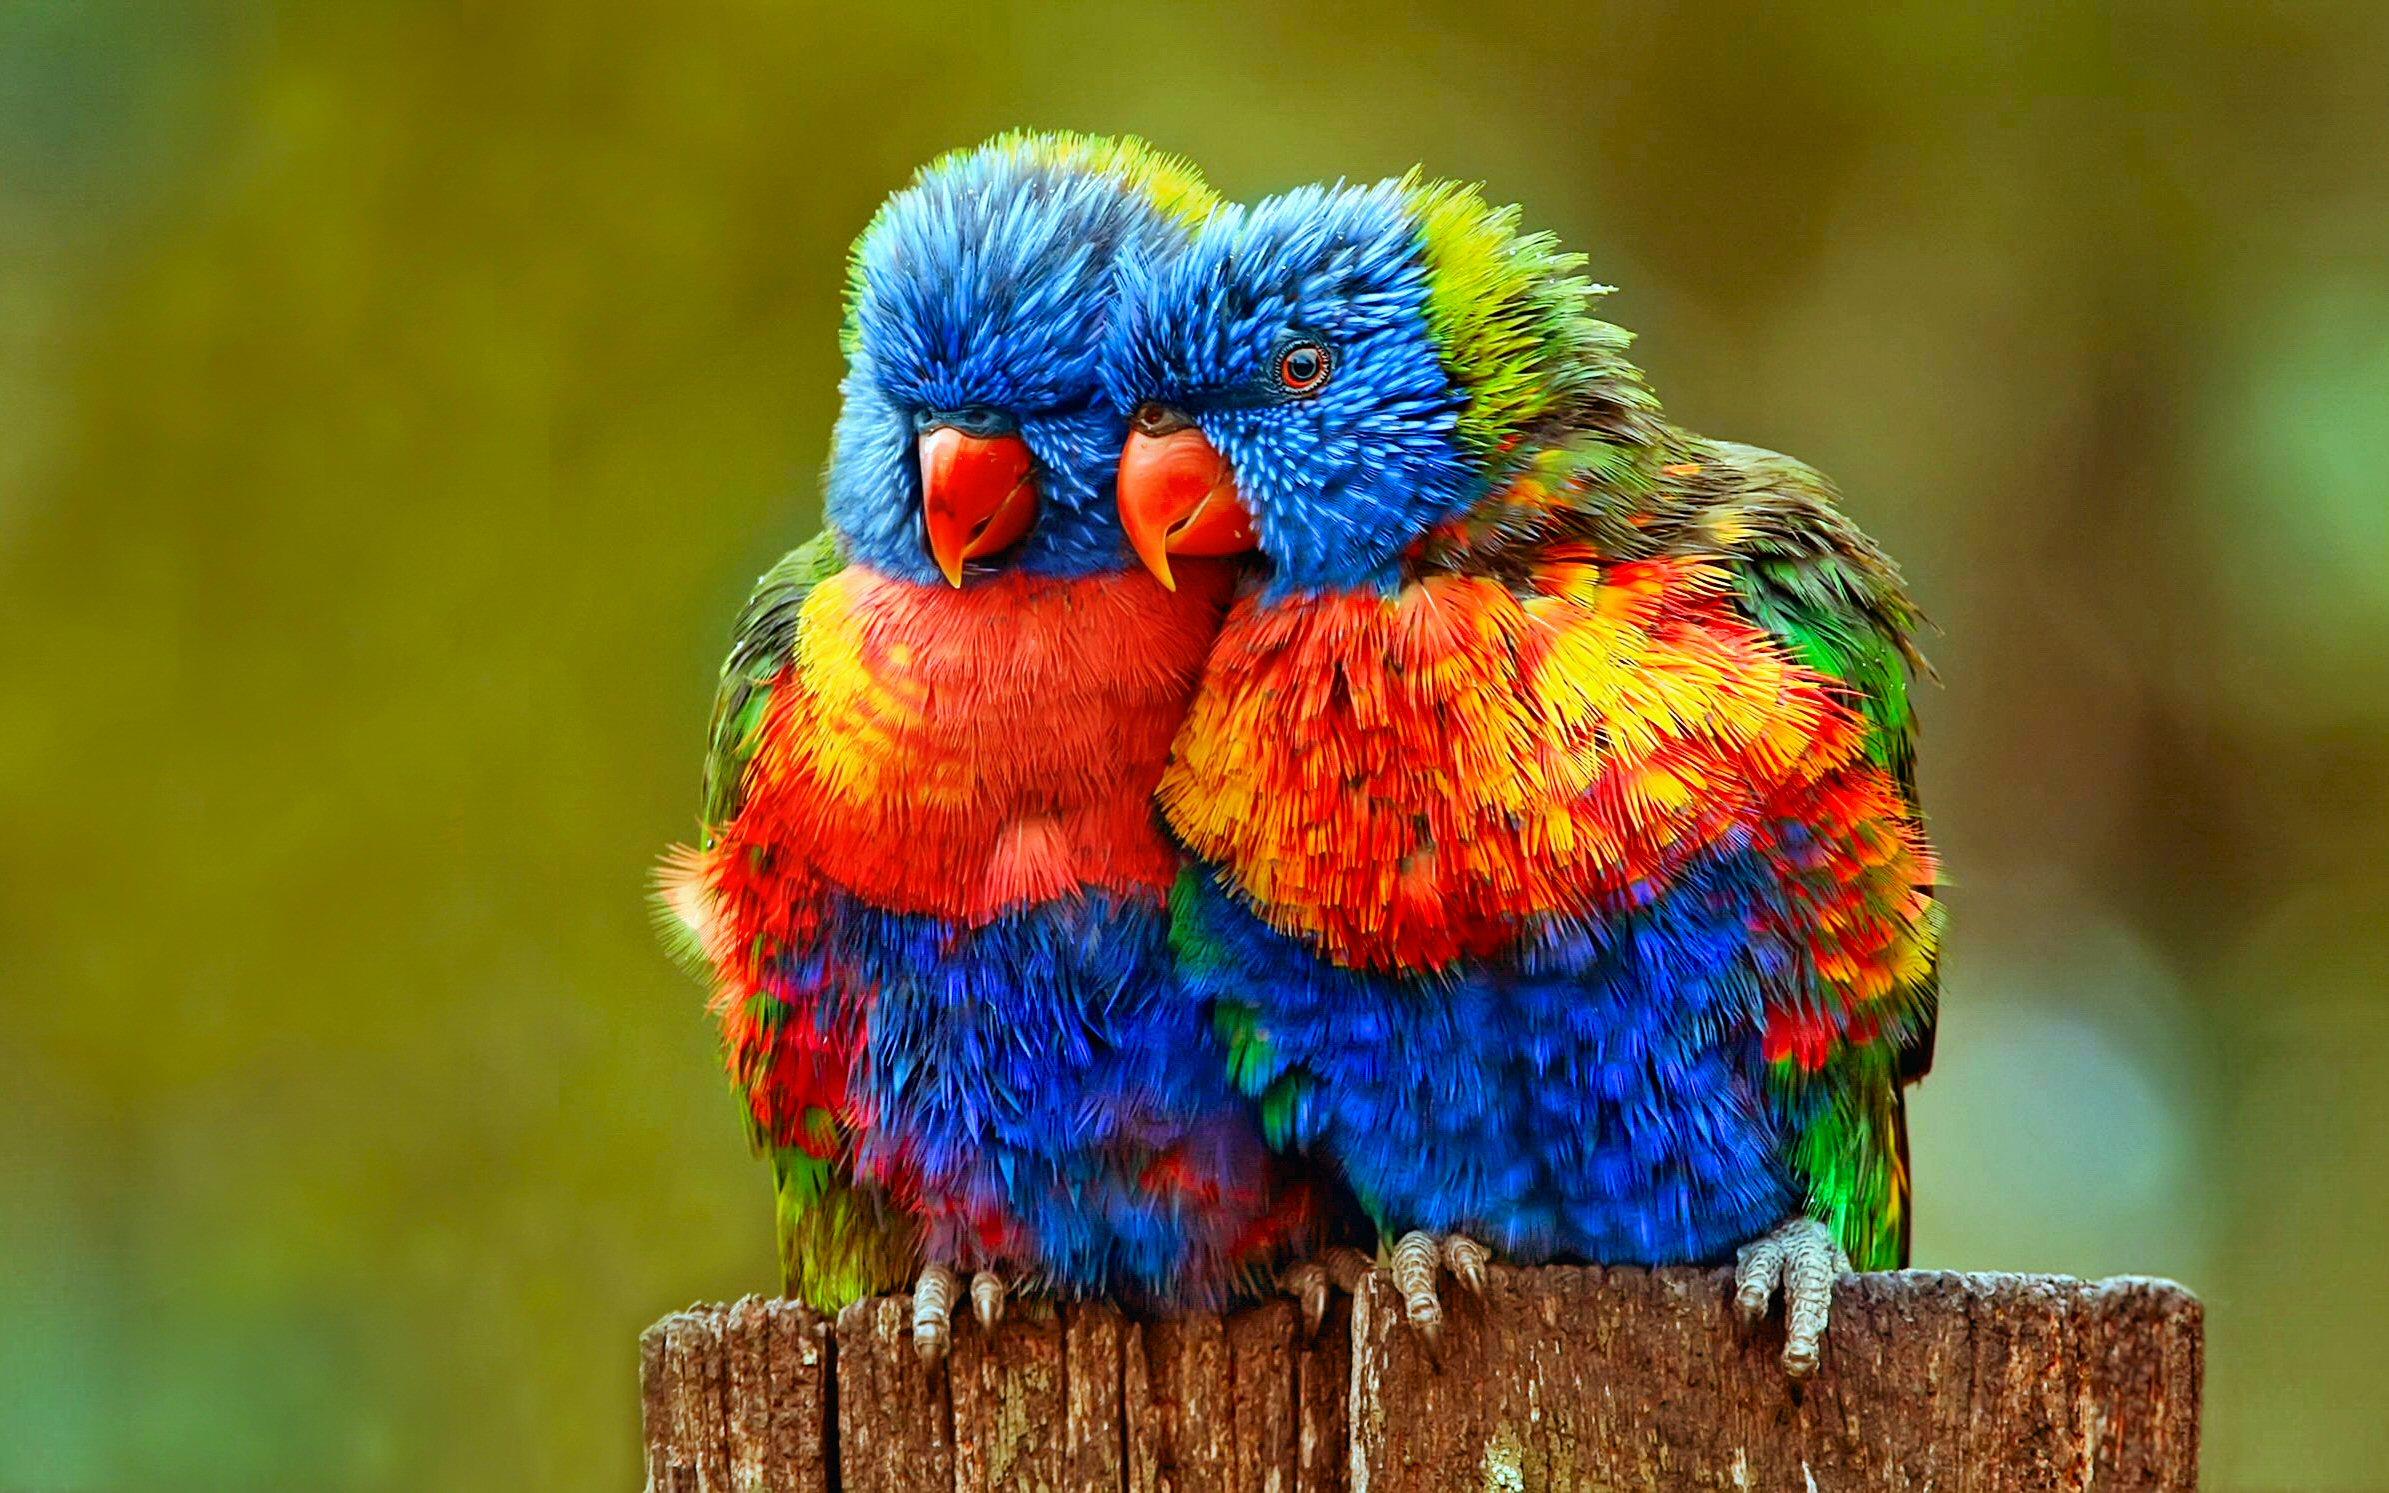 92 Rainbow Lorikeet HD Wallpapers Background Images   Wallpaper 2389x1493